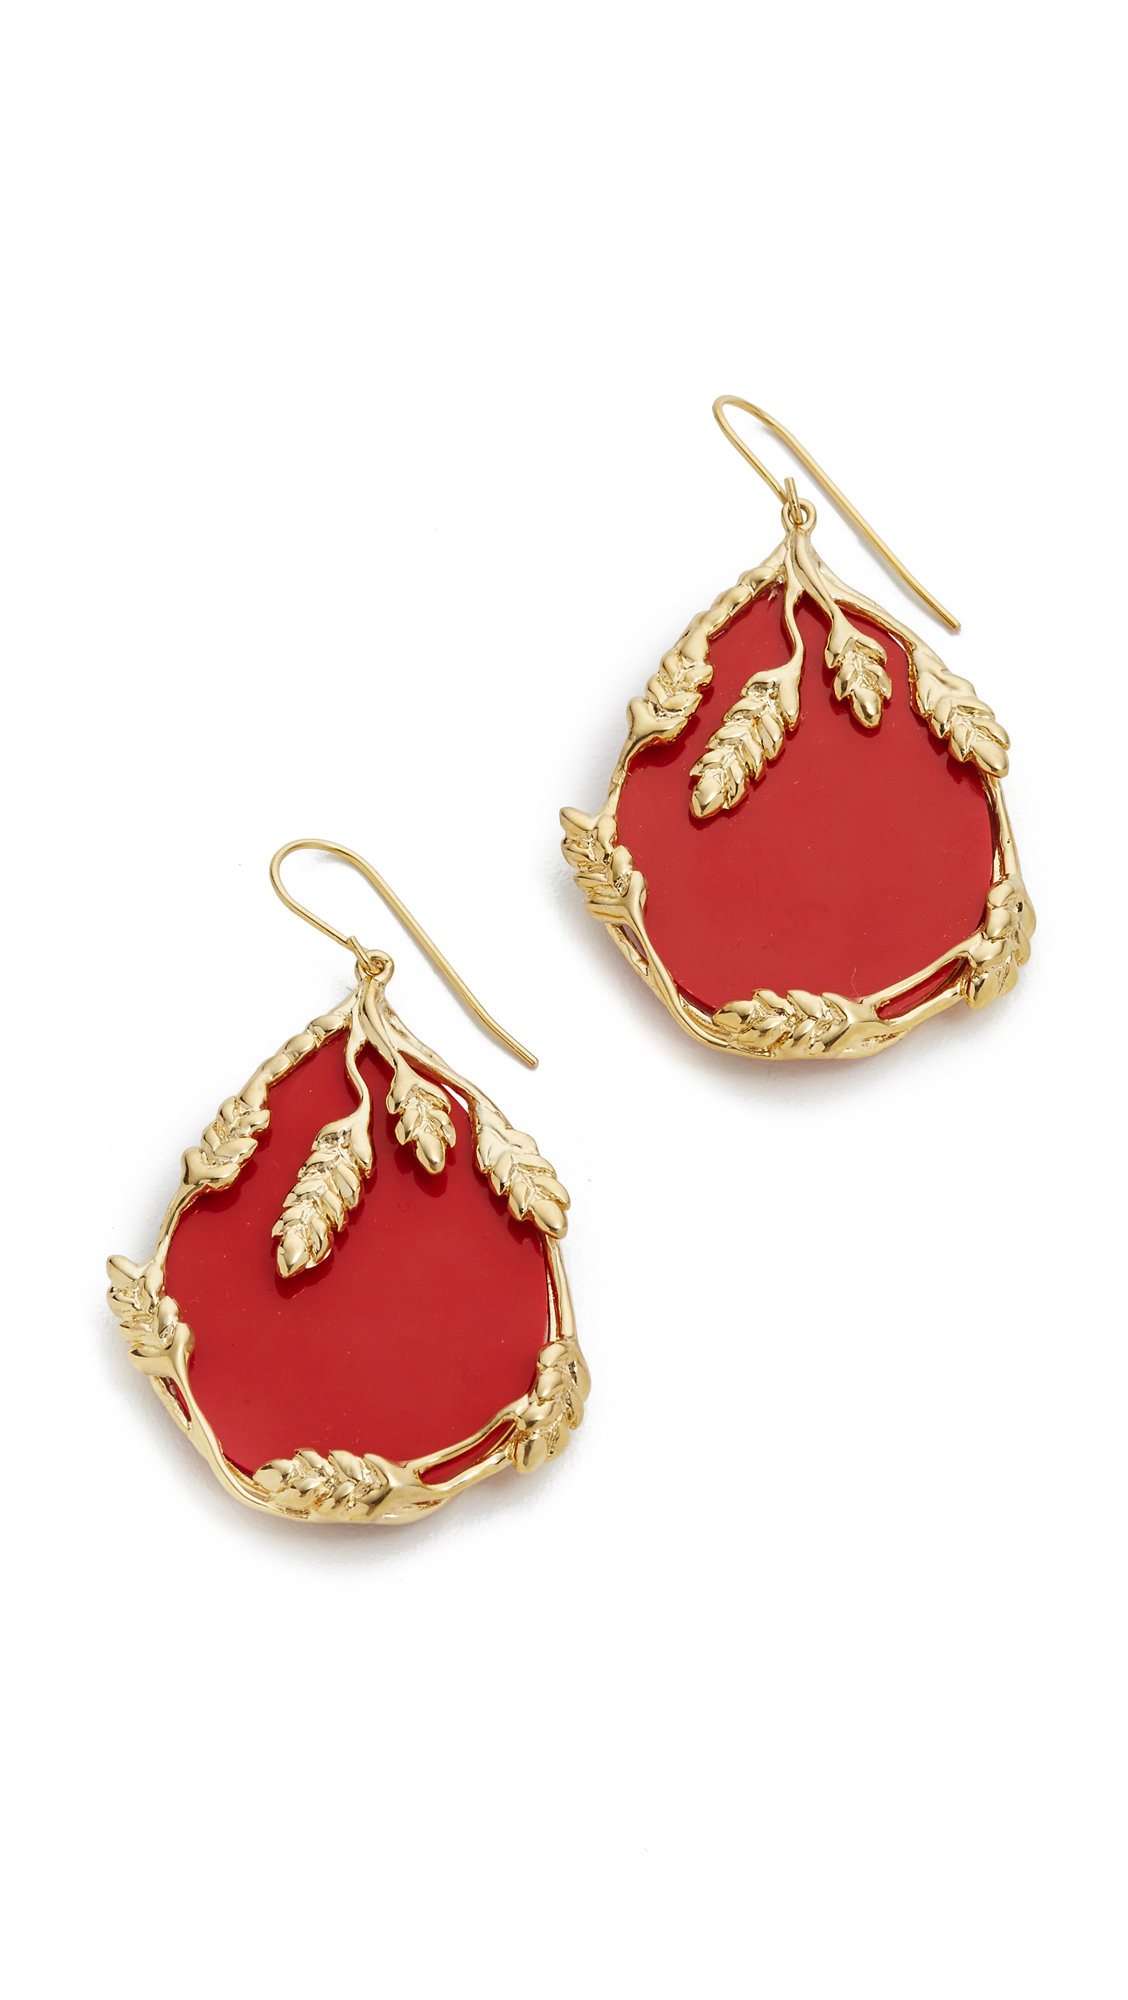 Aurelie Bidermann Francoise Earrings - Red/Gold at Shopbop